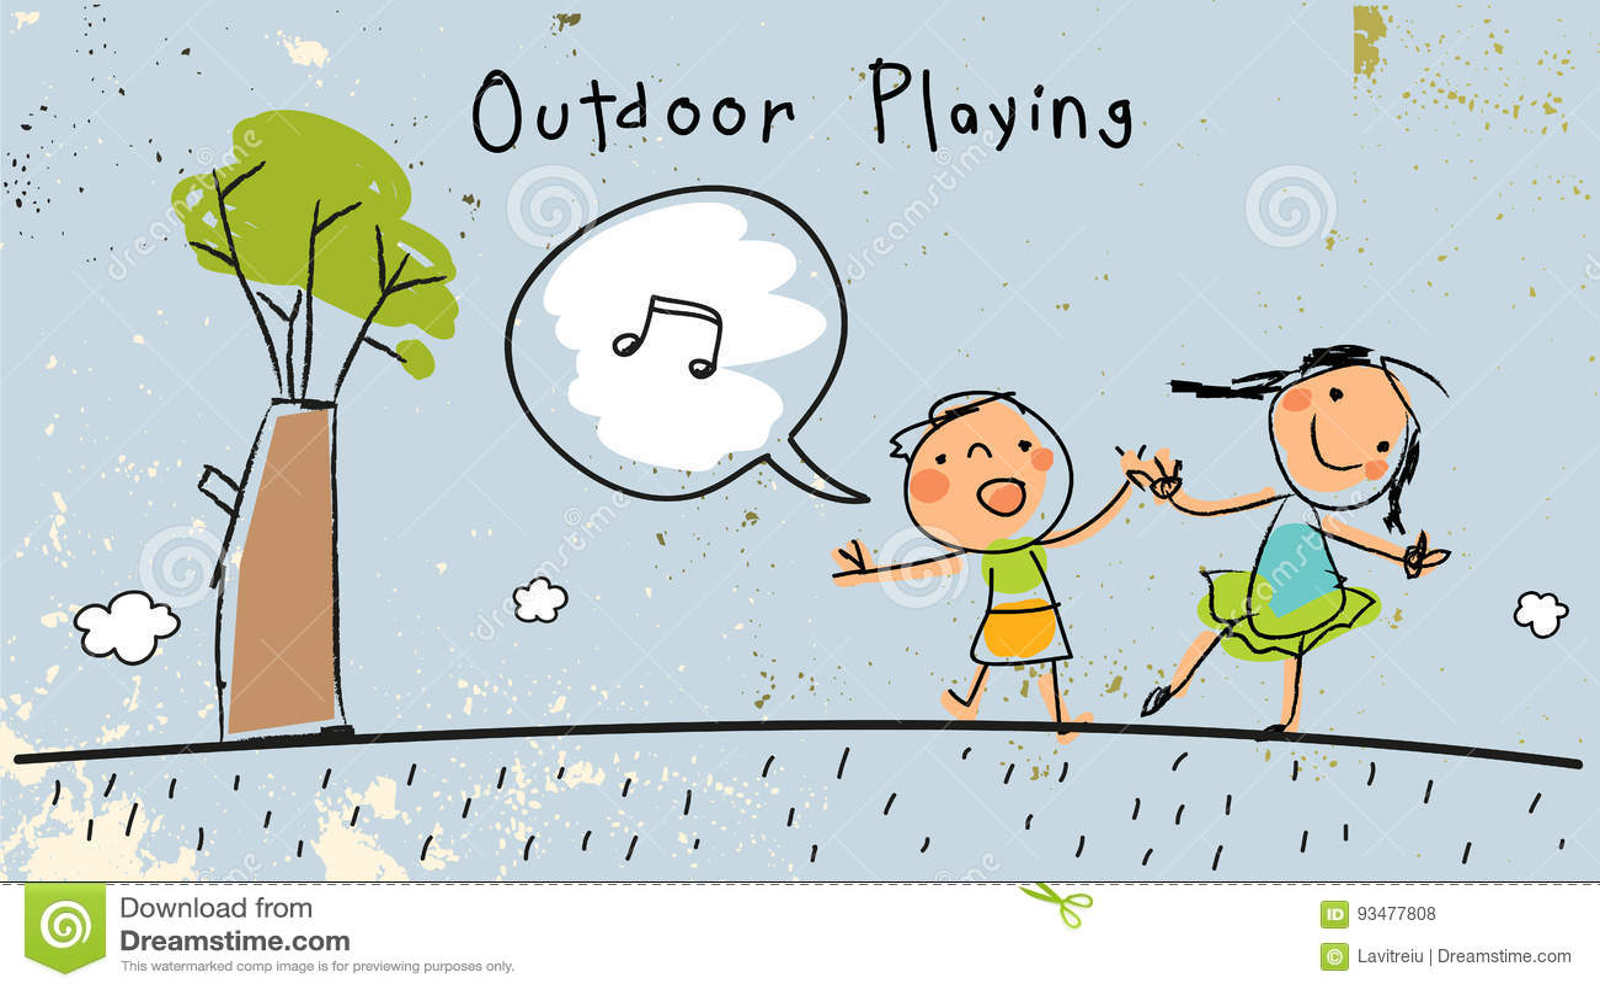 Children playing outdoors, singing.